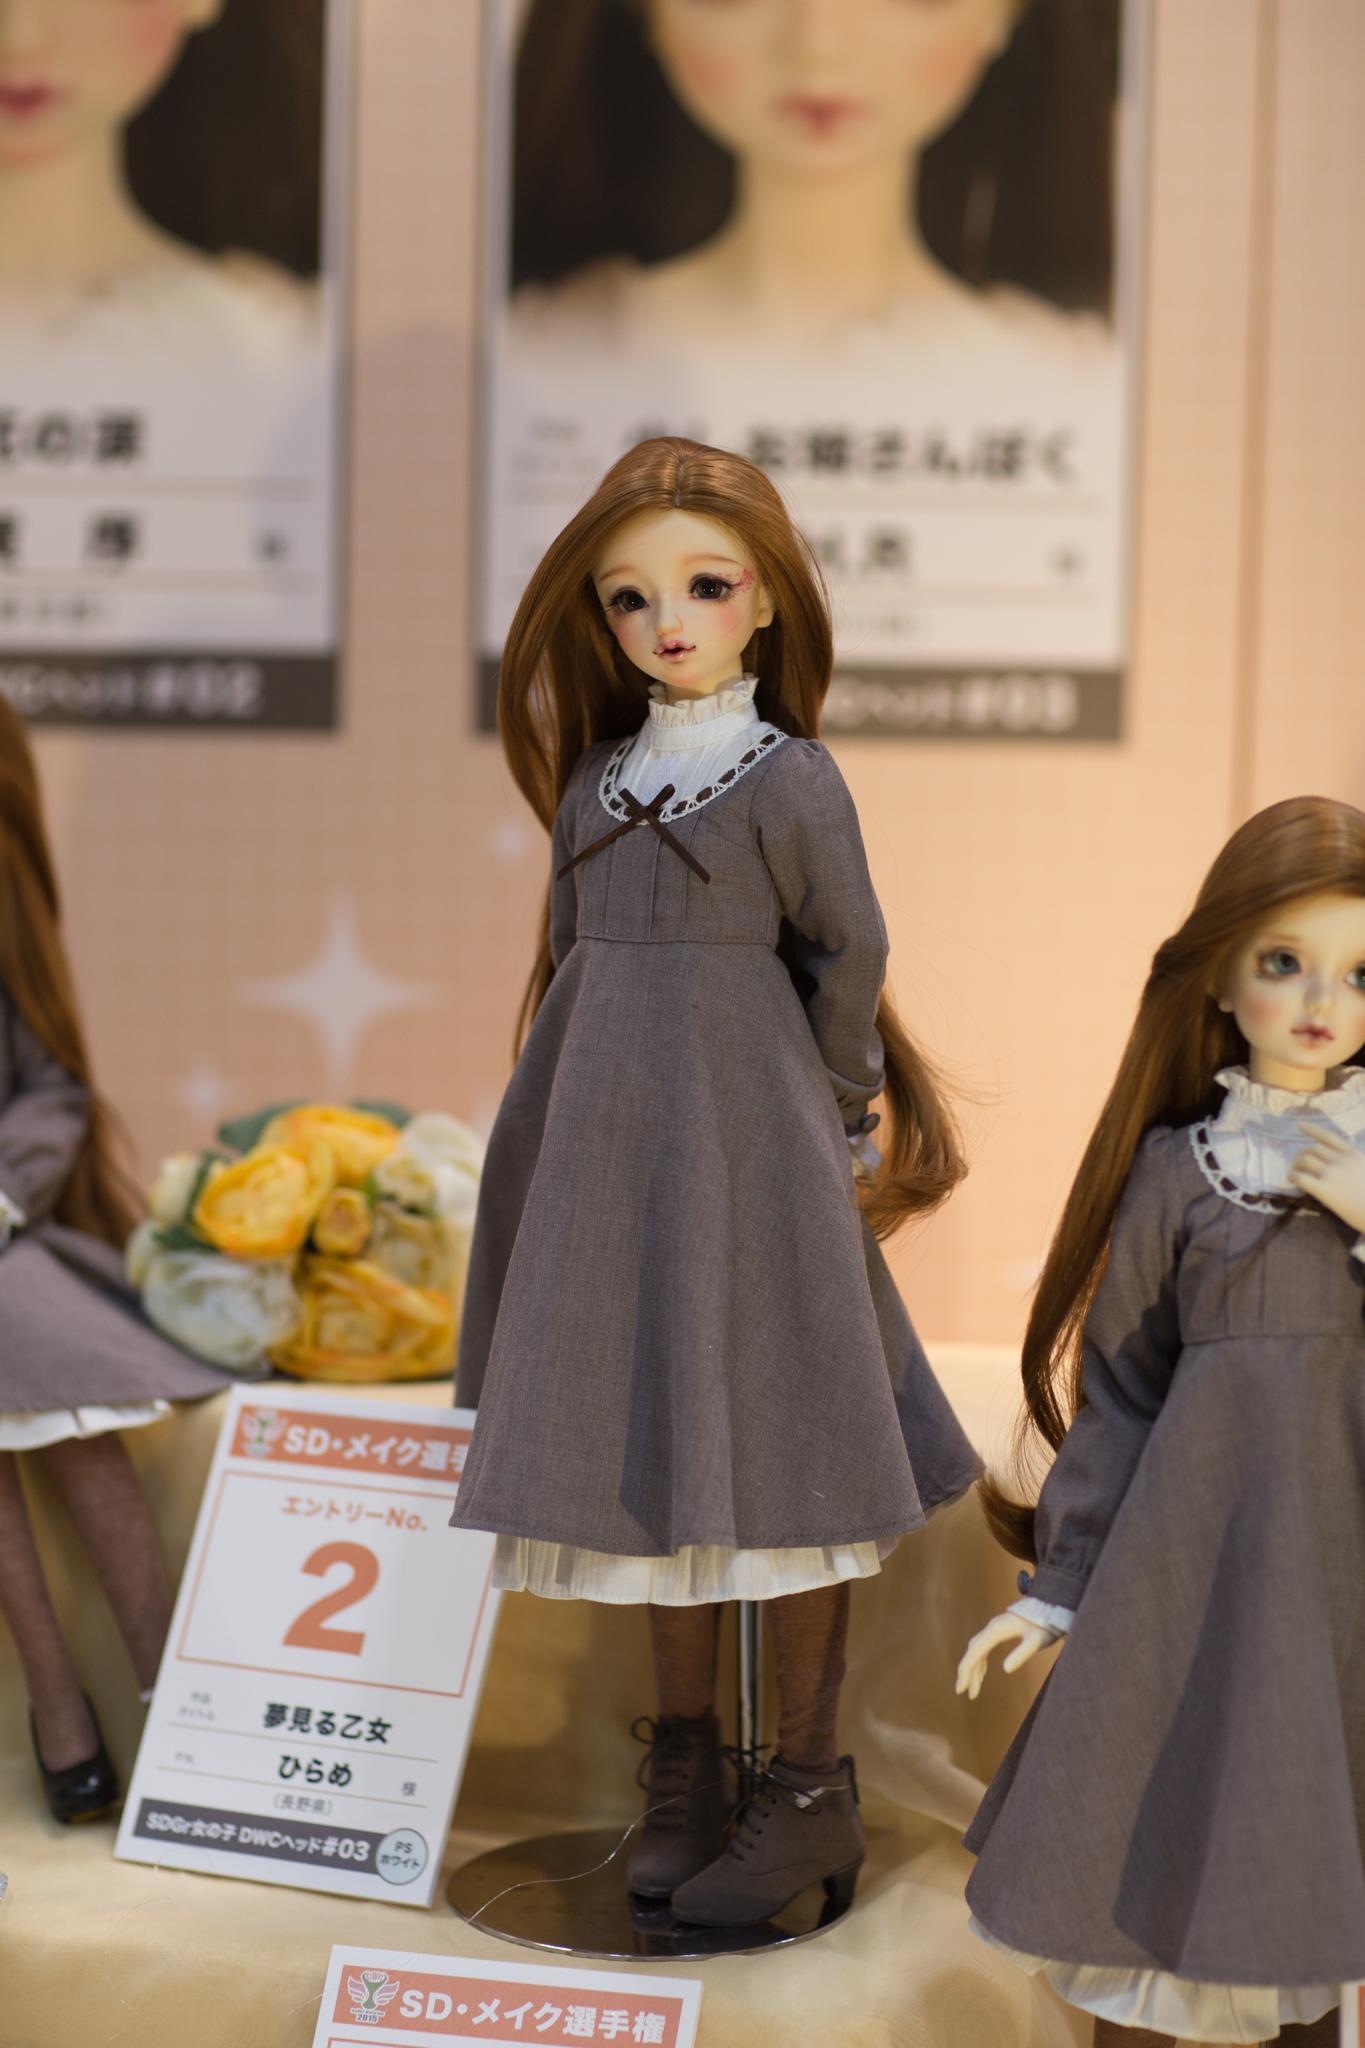 DWC2015_SD・メイク選手権_No.4 花の涙 P.N. 黄 序 様